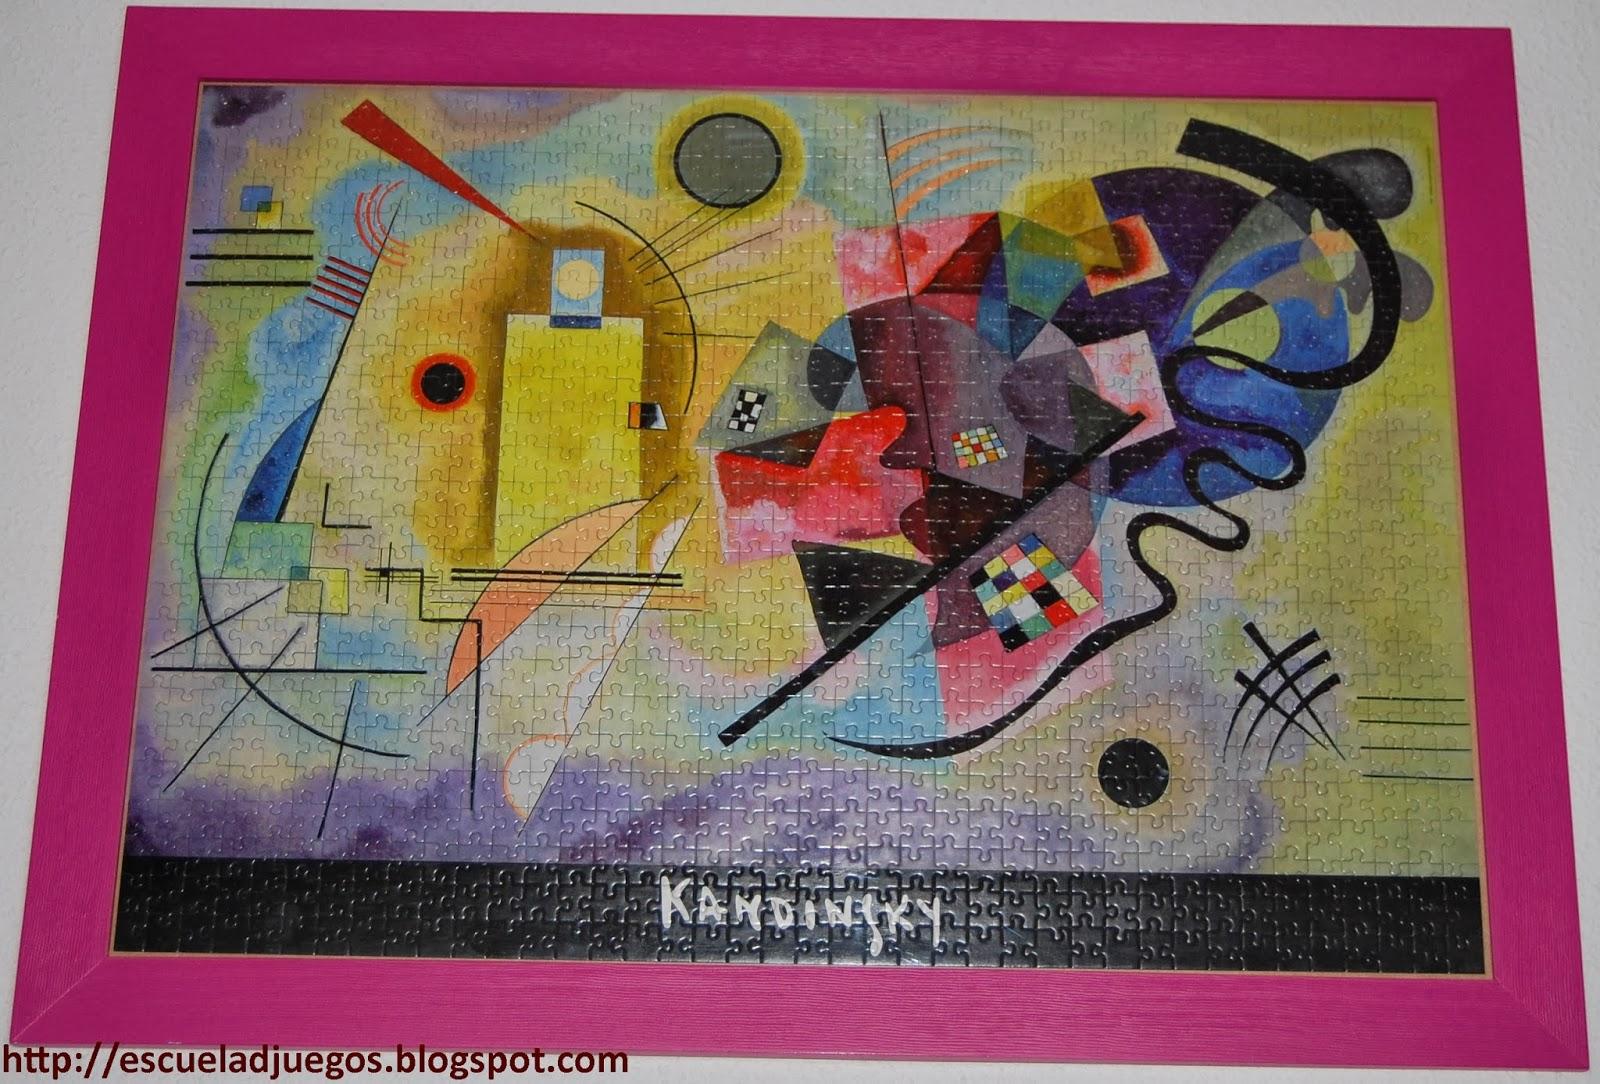 Puzzle de 1000 piezas de Educa sobre este famoso cuadro de Kandinsky